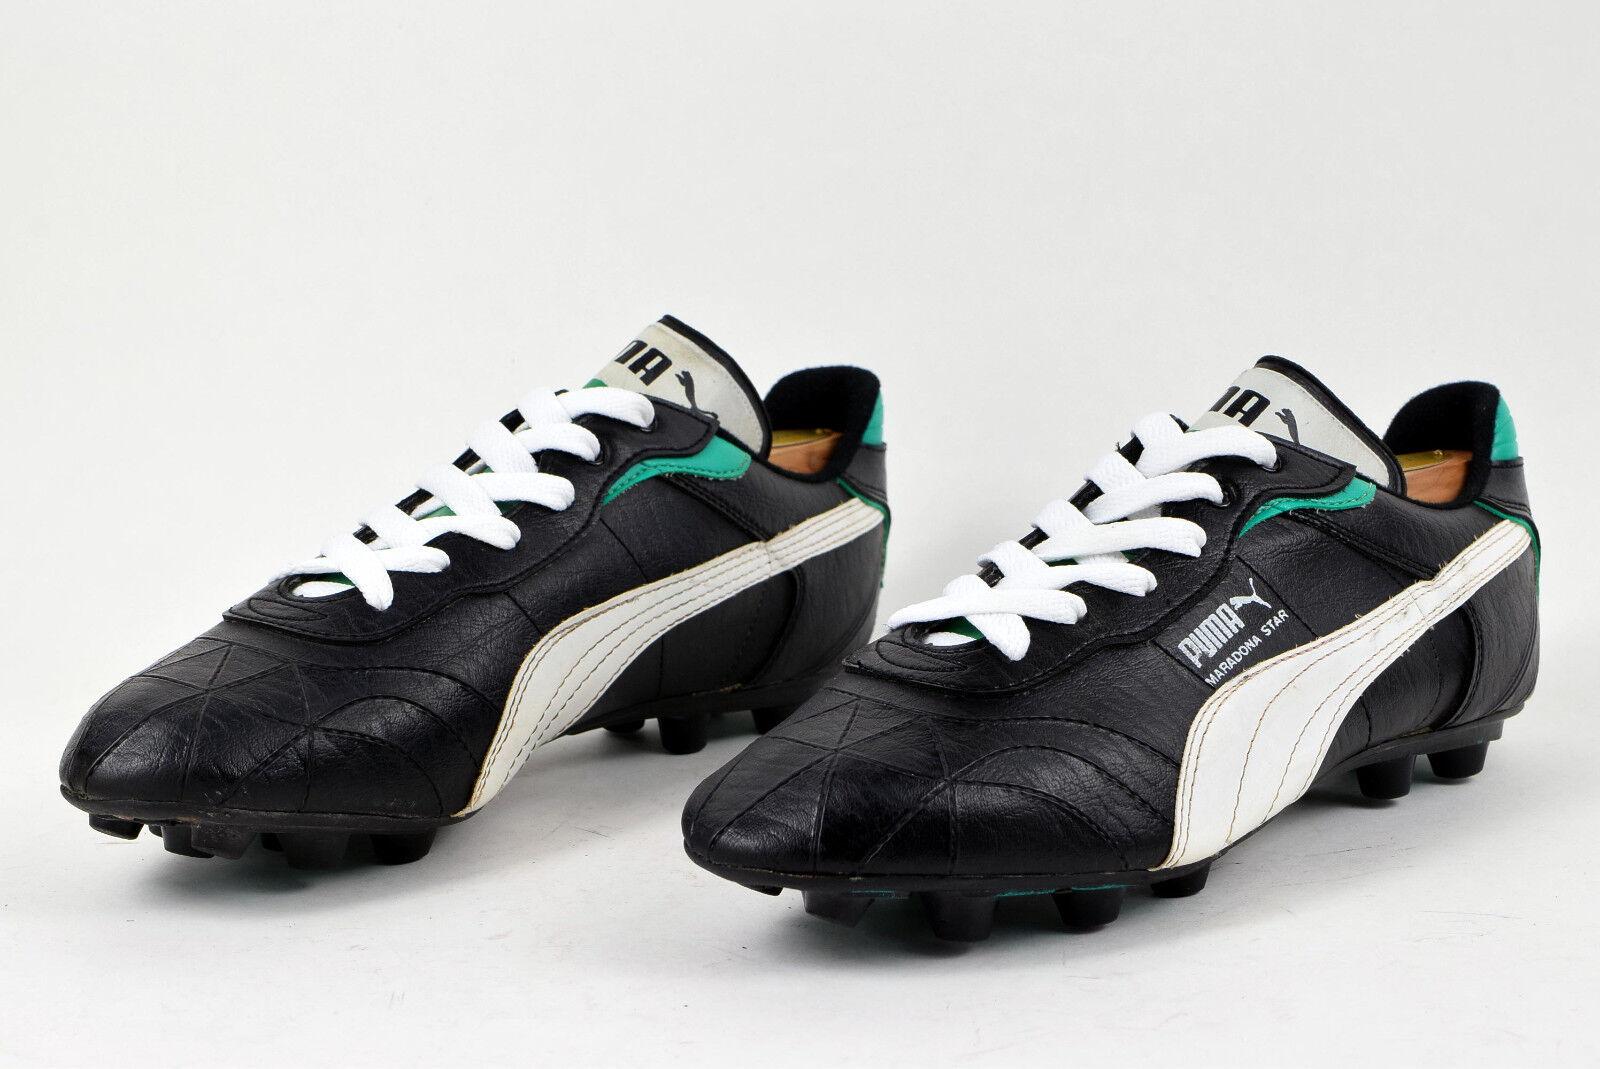 Puma Maradona Star Vintage Football Stiefel Größe 9.5 Soccer Schuhes